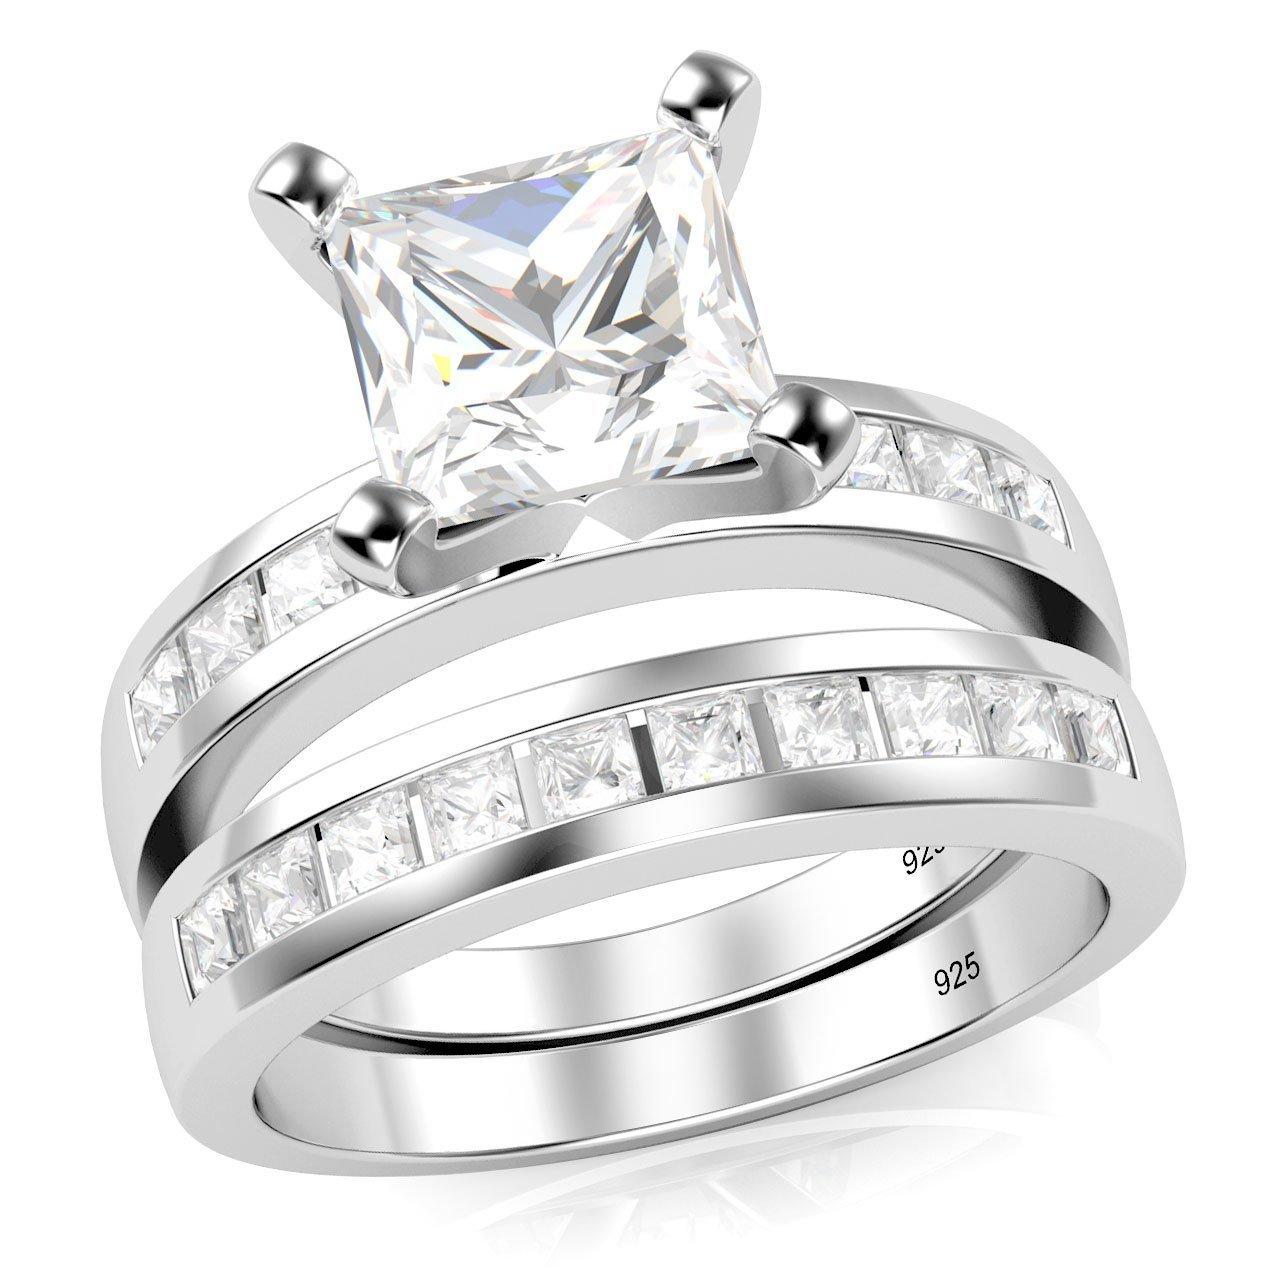 Sz 6 Sterling Silver Cubic Zirconia Princess Cut CZ Wedding Engagement Ring Set